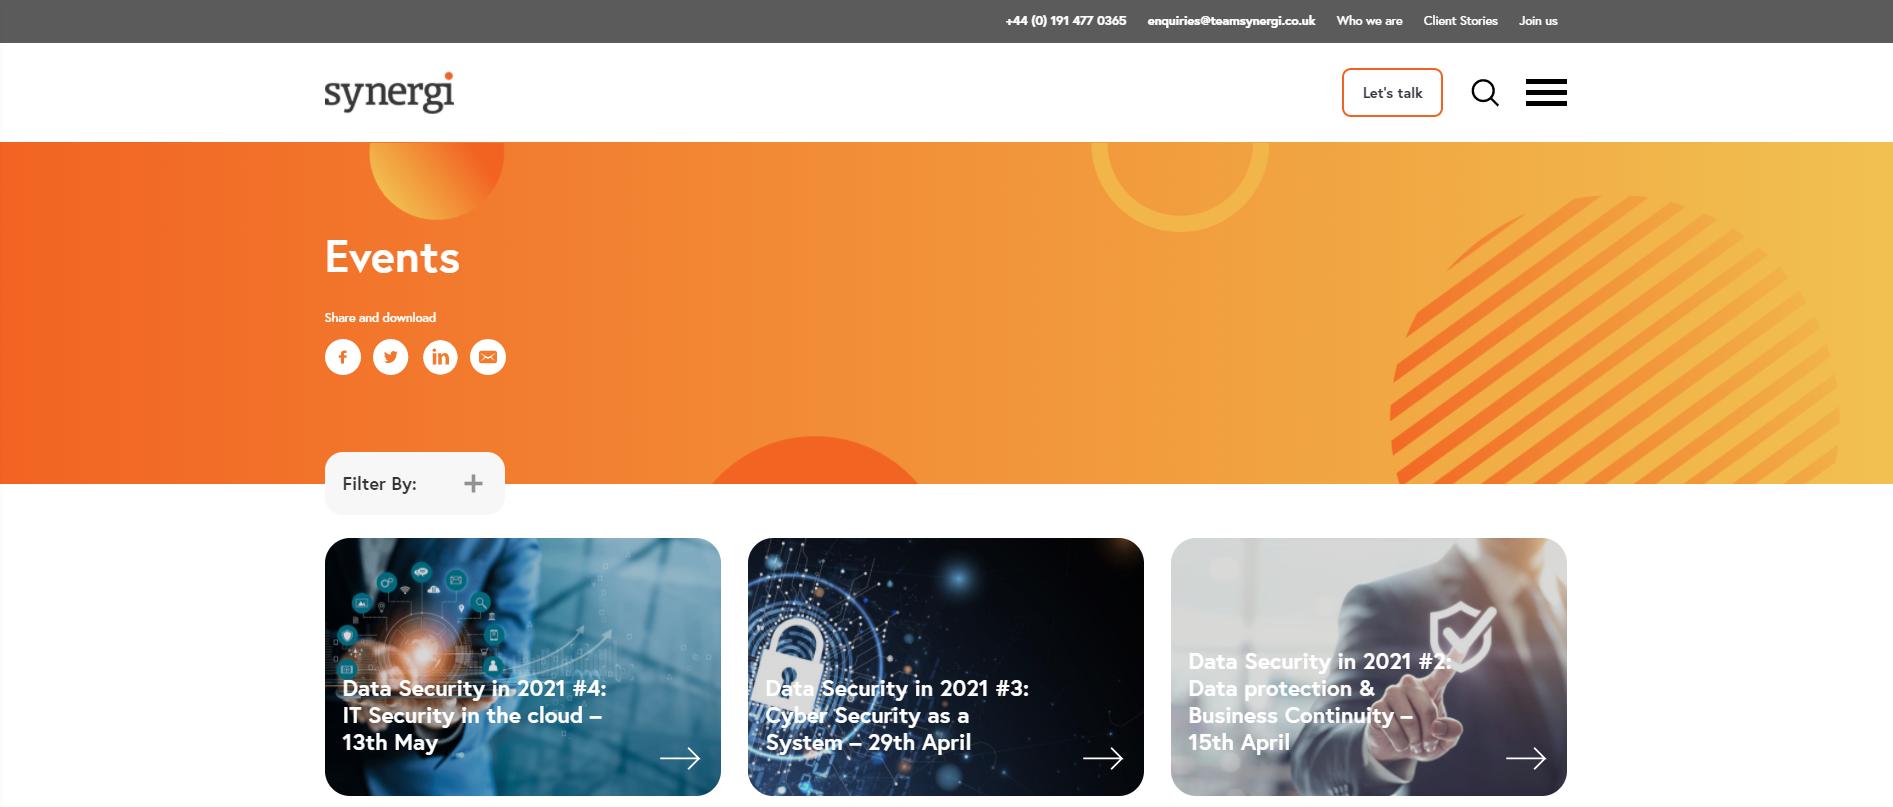 Screenshot 2021-03-18 112539-Synergi launches on-demand webinar access